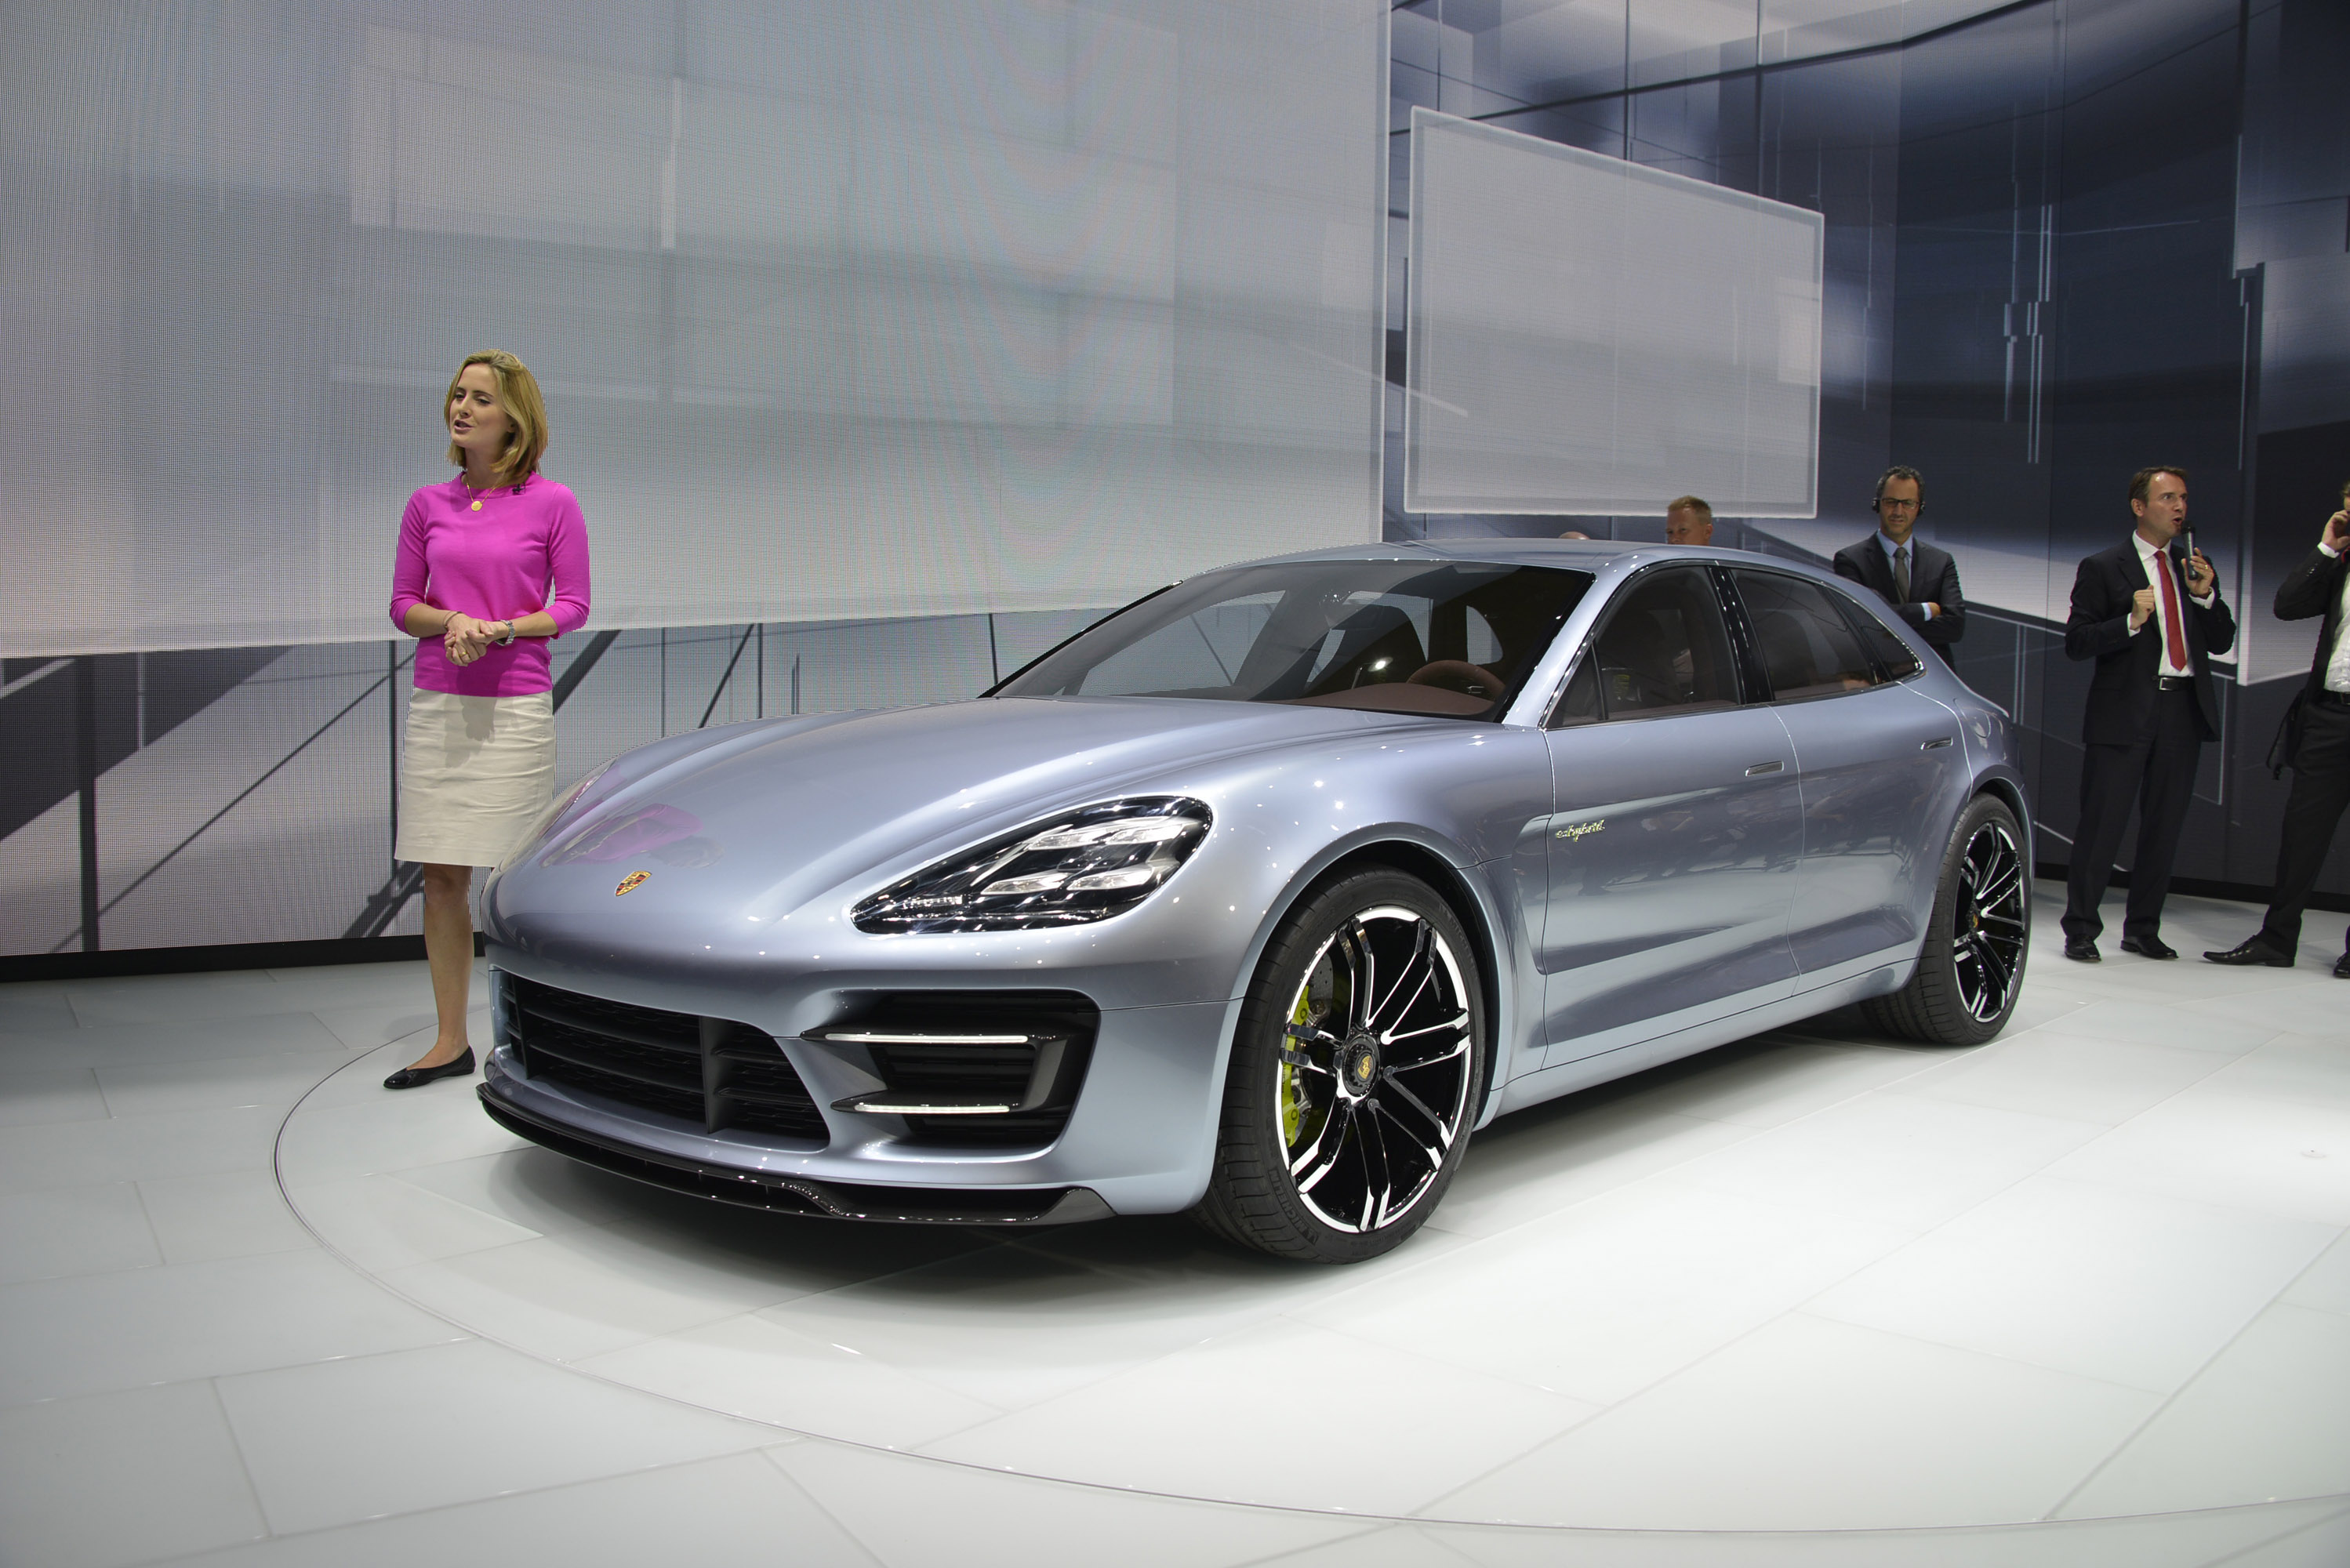 Lithium Ion Car Battery >> Glimpse of the new Porsche Panamera Sport Turismo Concept Car